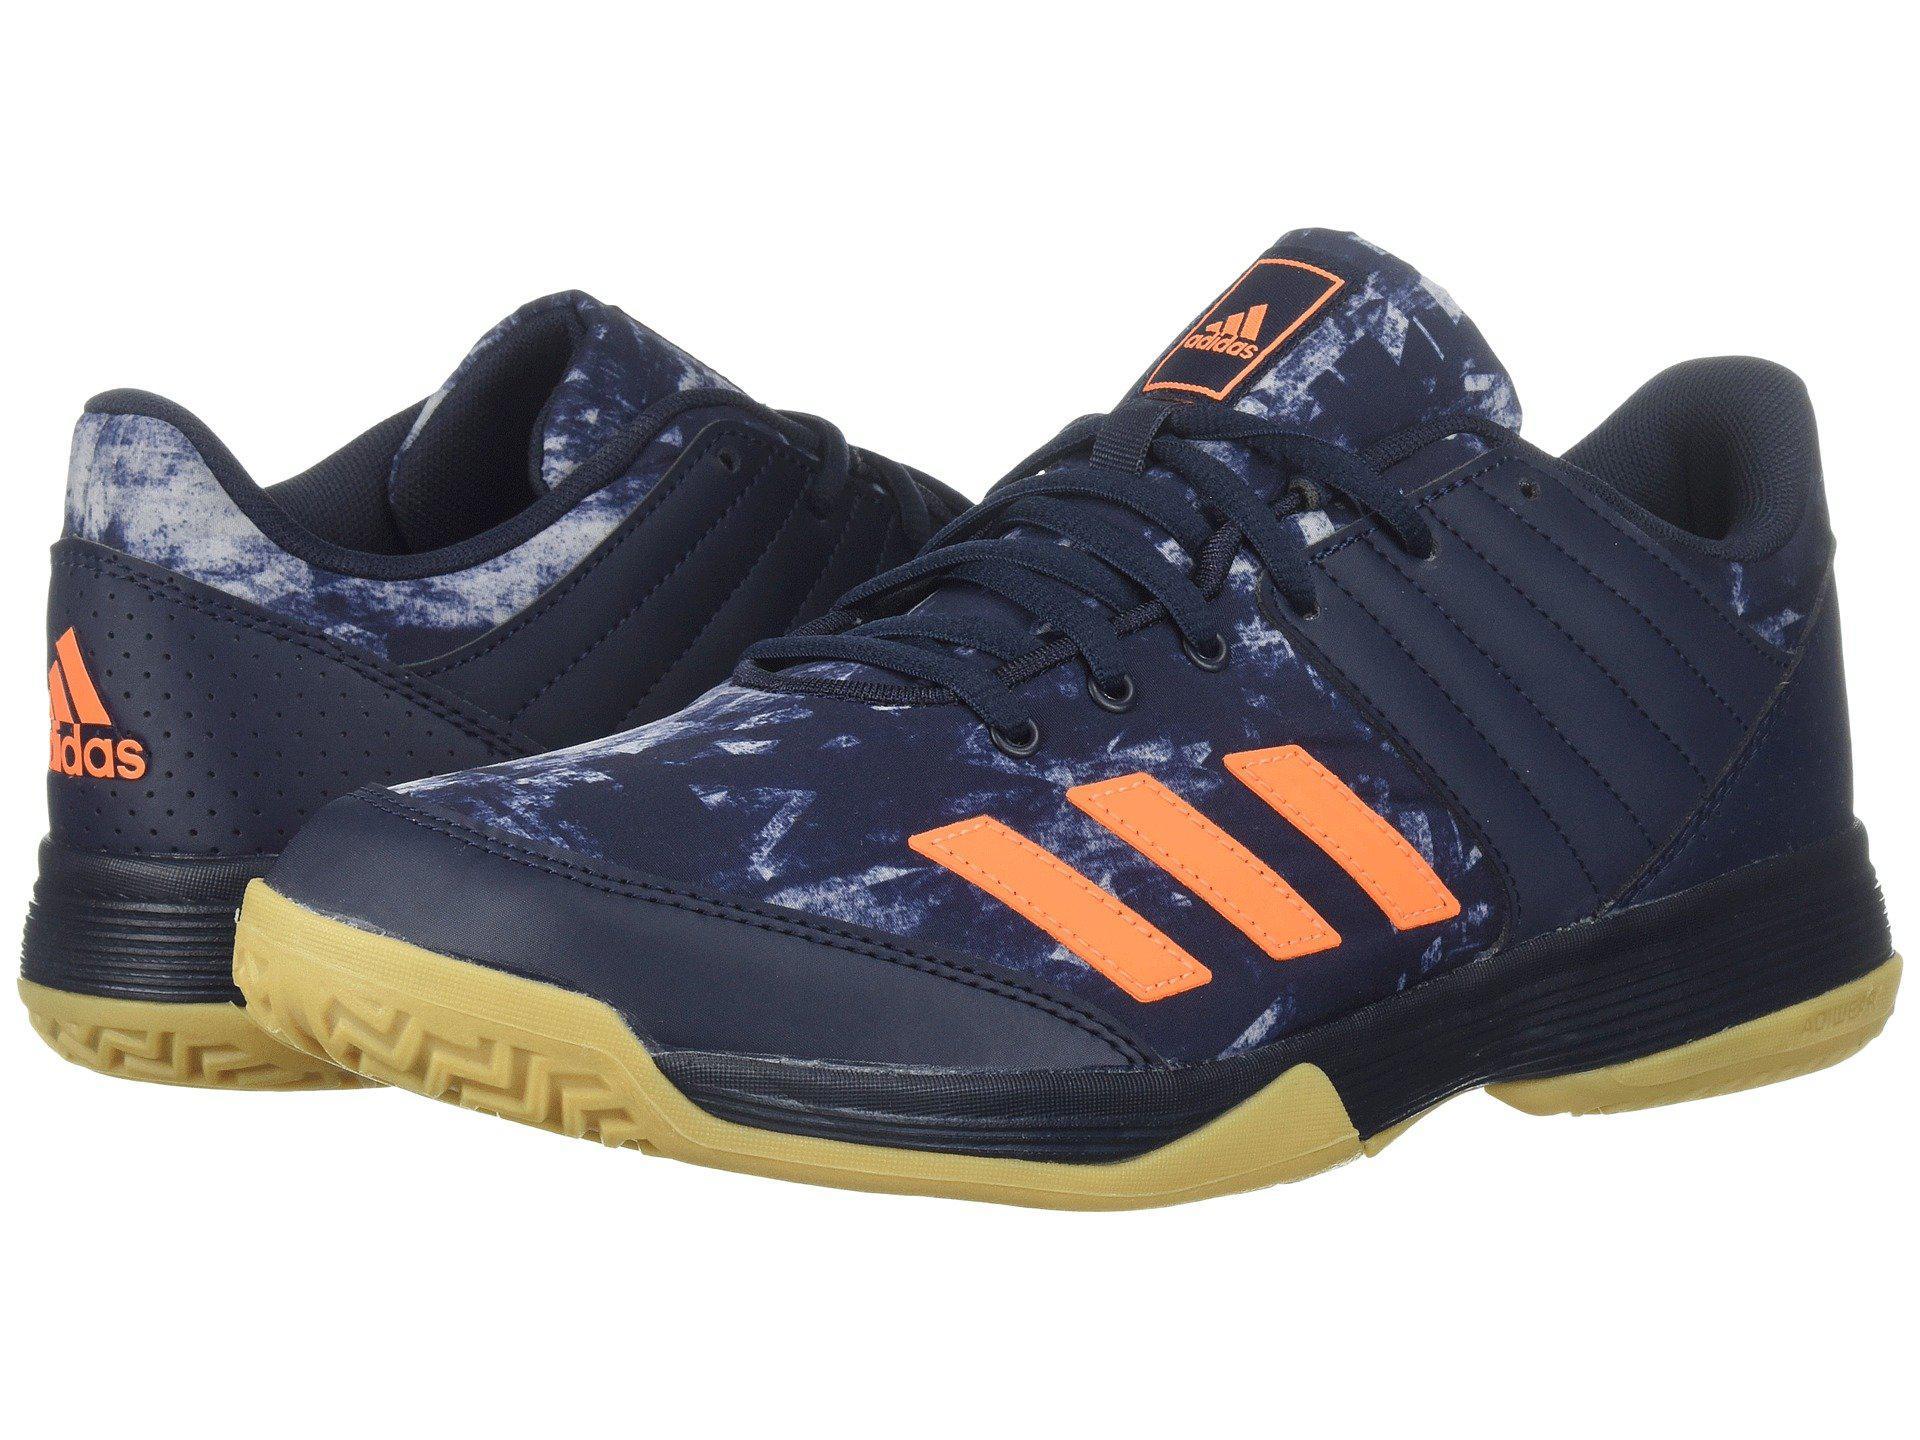 4d8501ea032a Adidas Res 5 Pvq6w Men s Two Legend Lyst Inkhi Ligra Orangegrey 4pwSnF0W